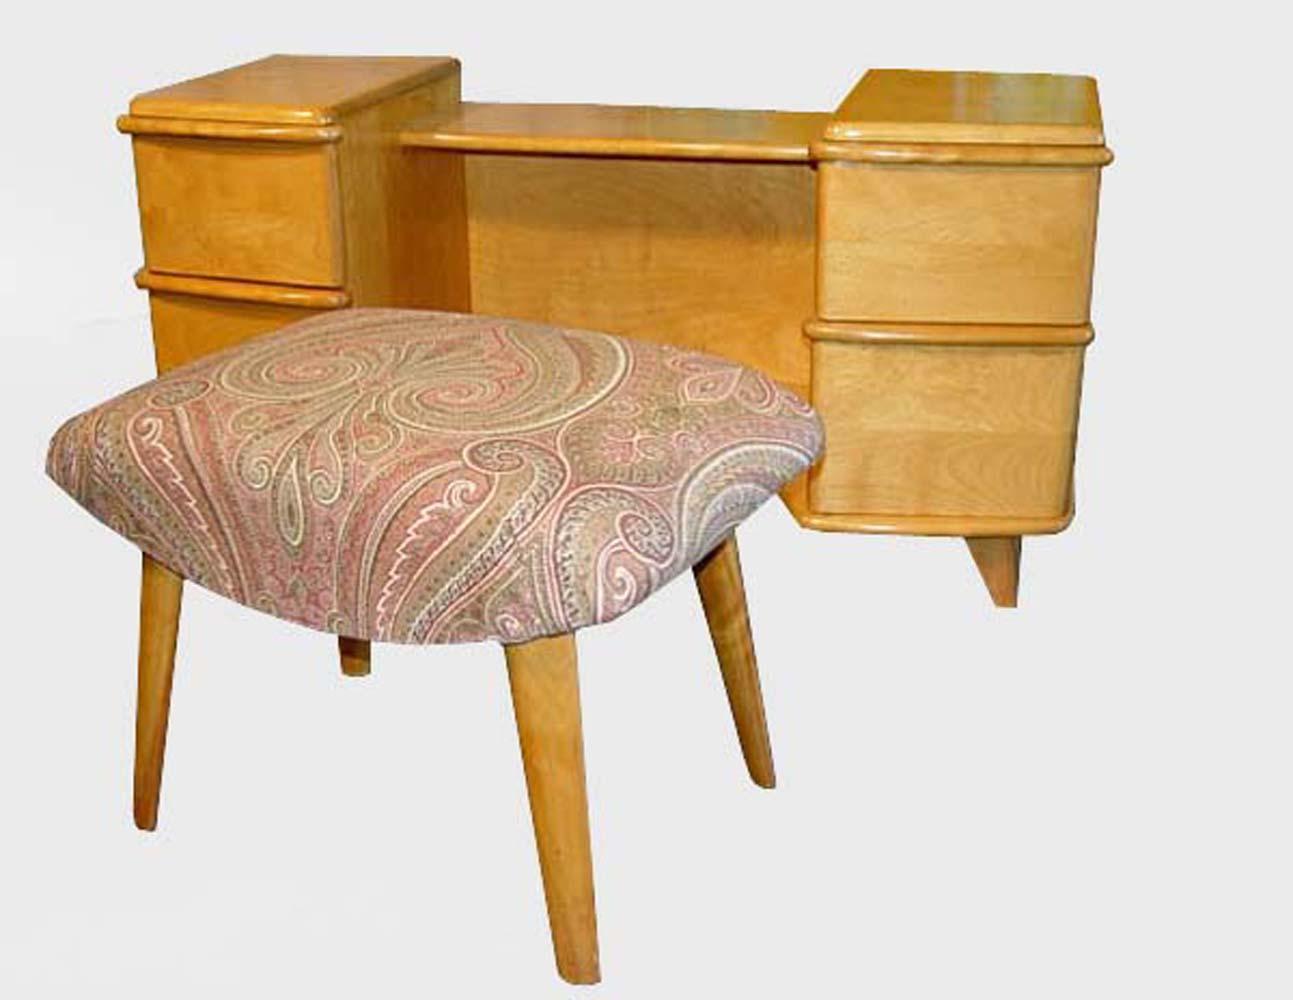 vintage school desk chair combo slipcovers t cushion 2 piece heywood wakefield hostgarcia